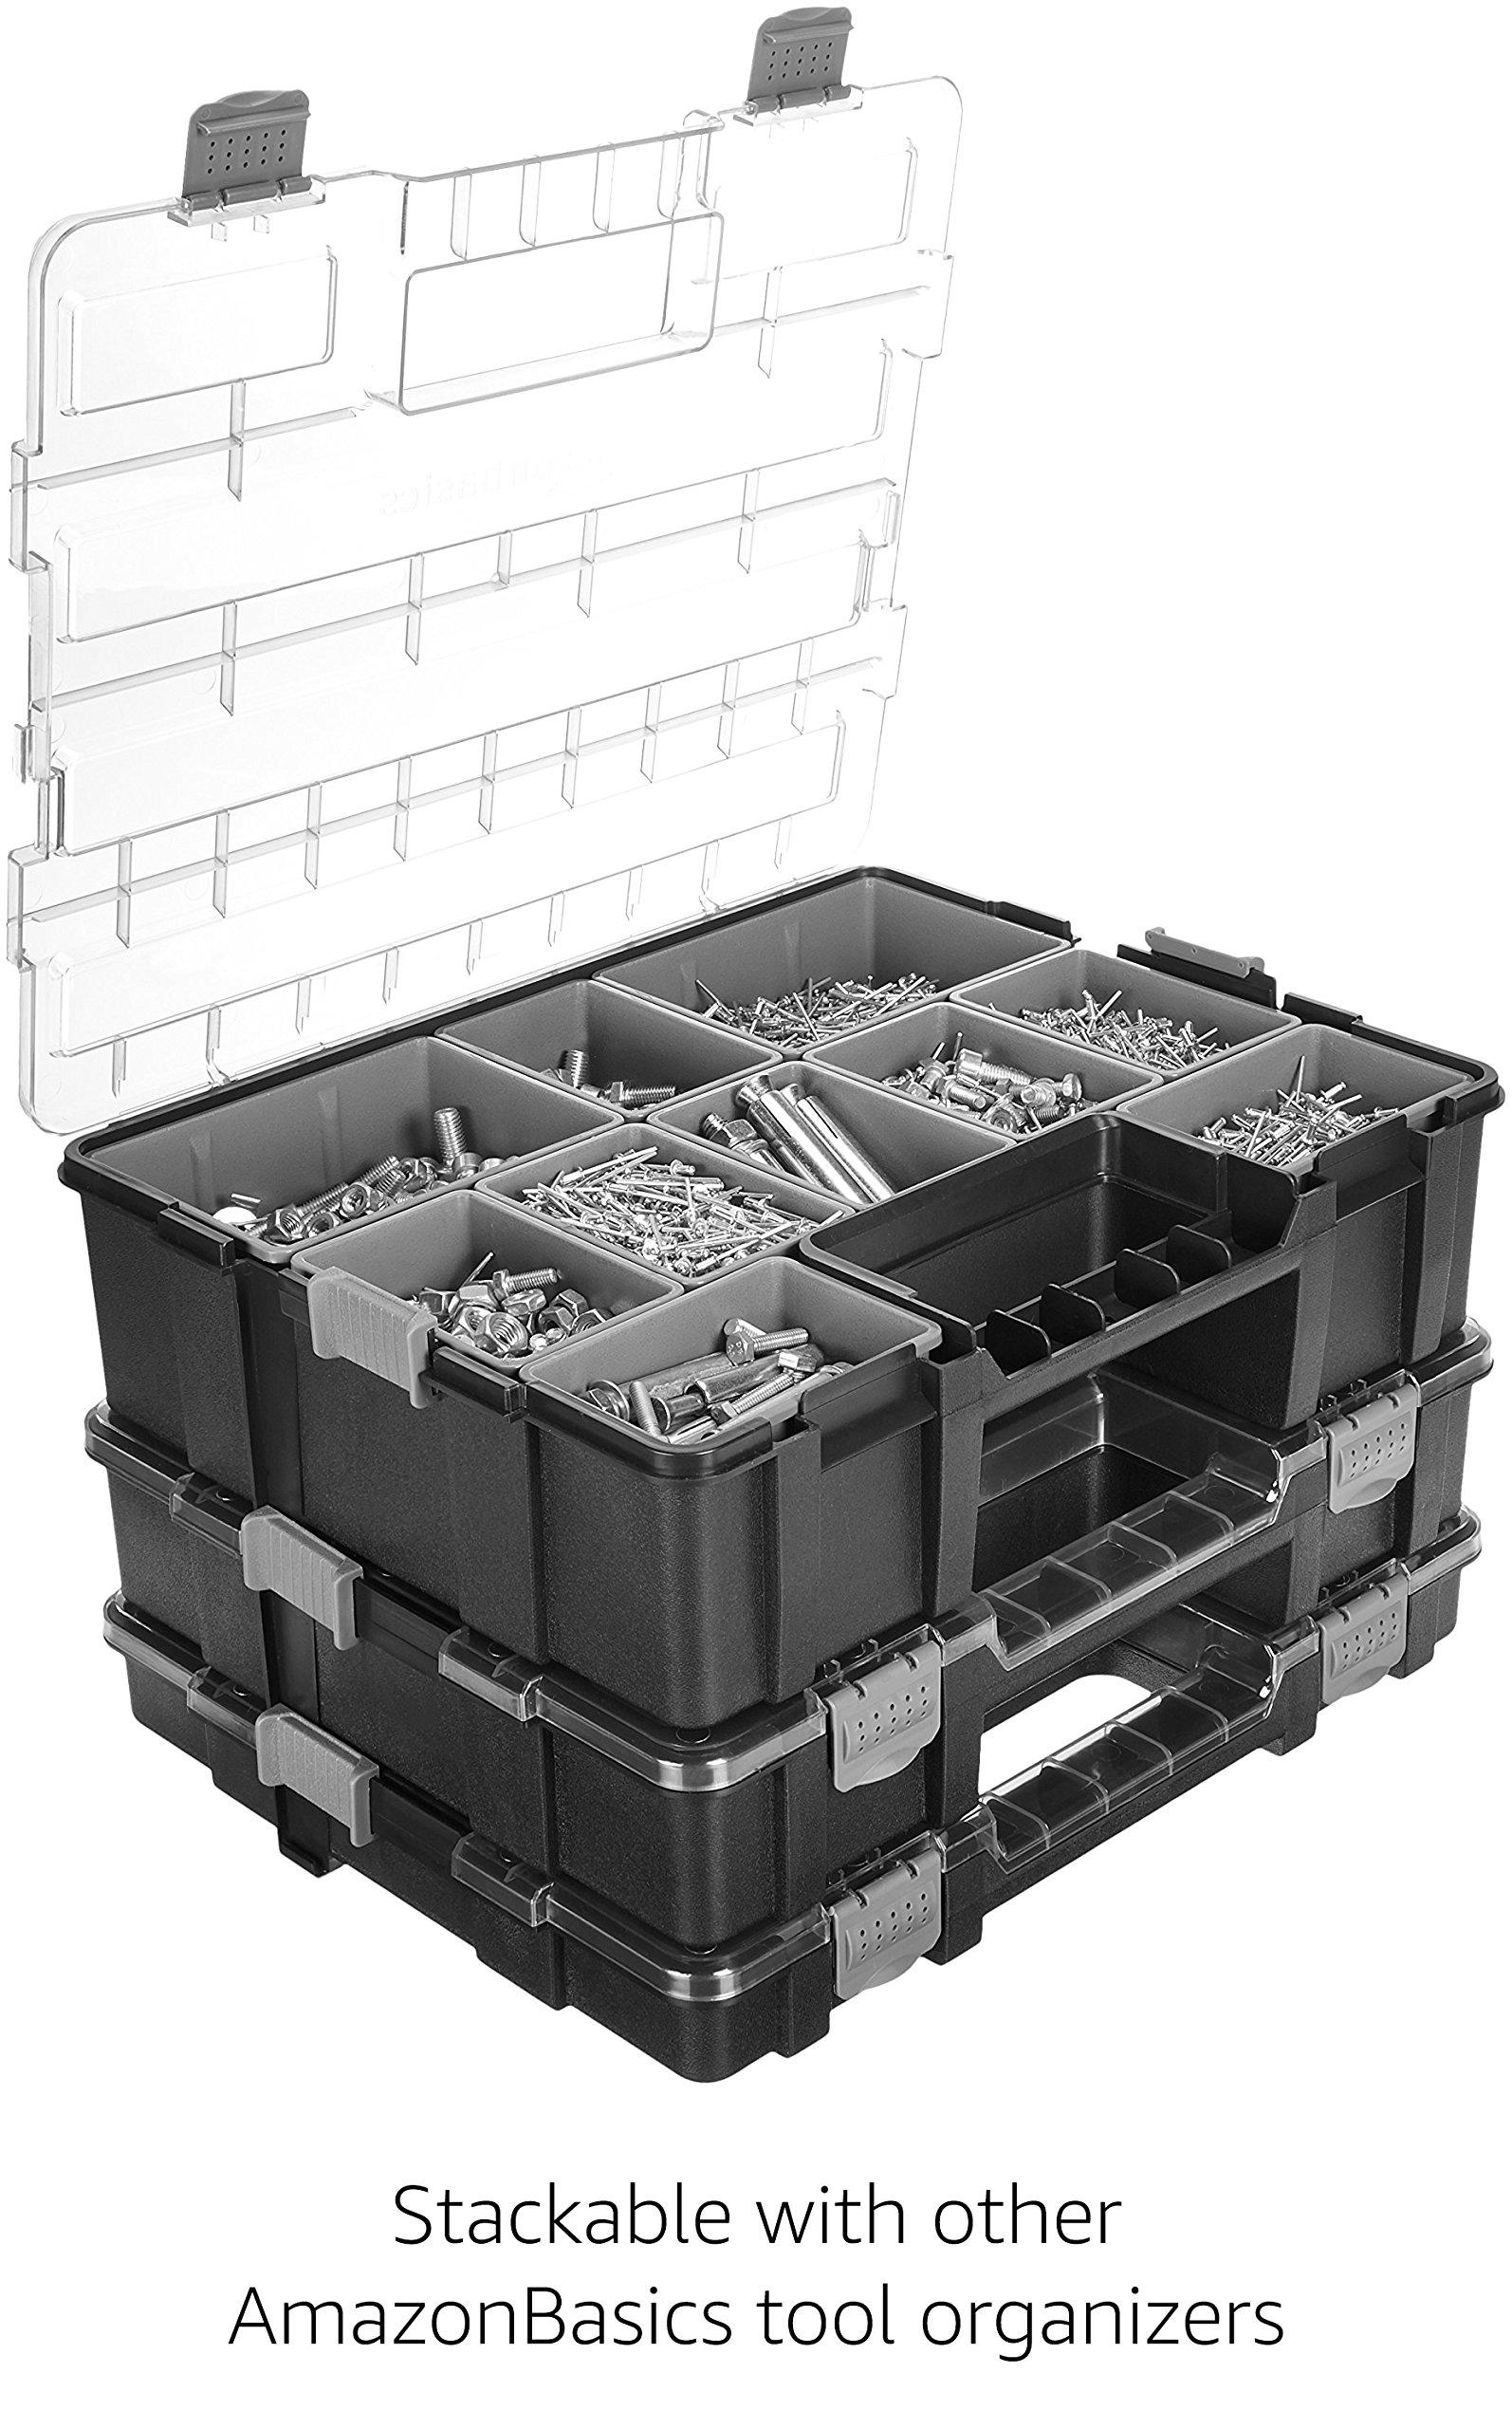 AmazonBasics Tool Organizer - 10 Compartments by AmazonBasics (Image #3)